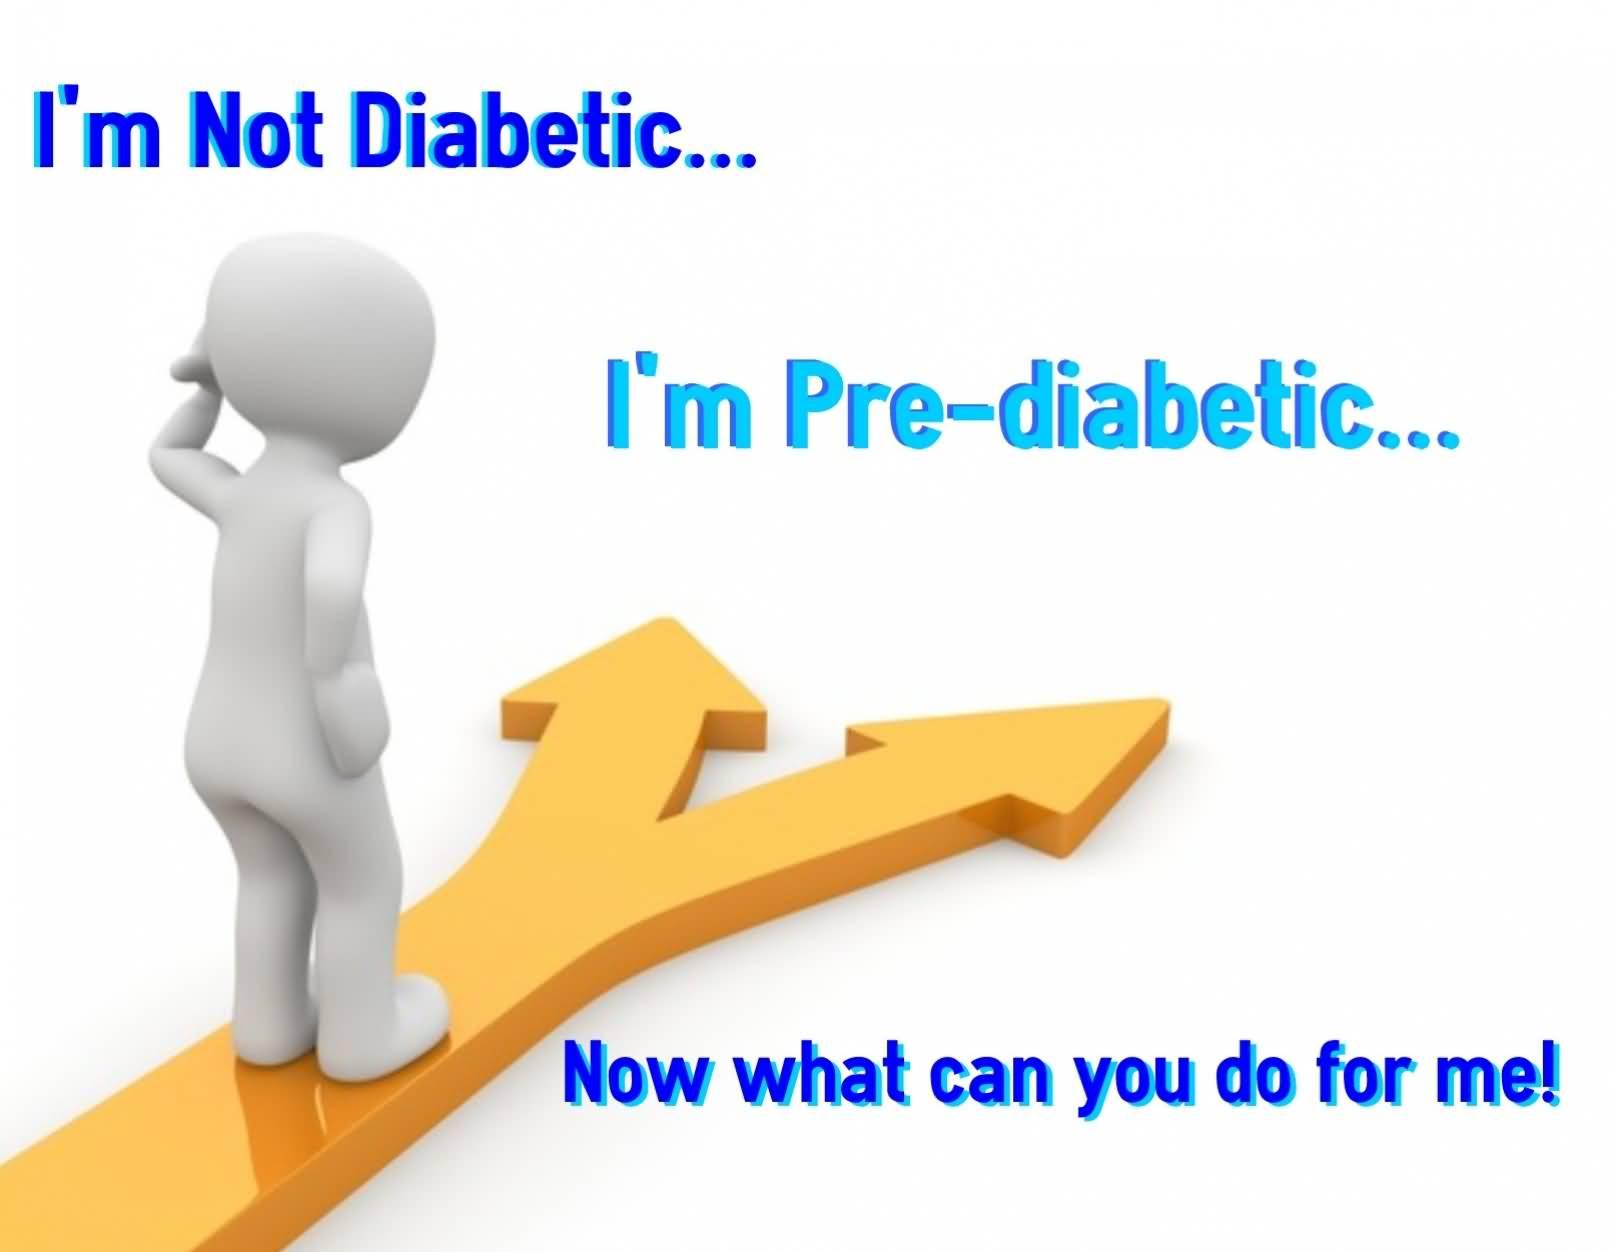 Superbe Diabetes Life Insurance Quotes Inspiration 20 Diabetes Life Insurance Quotes  And Sayings Quotesbae